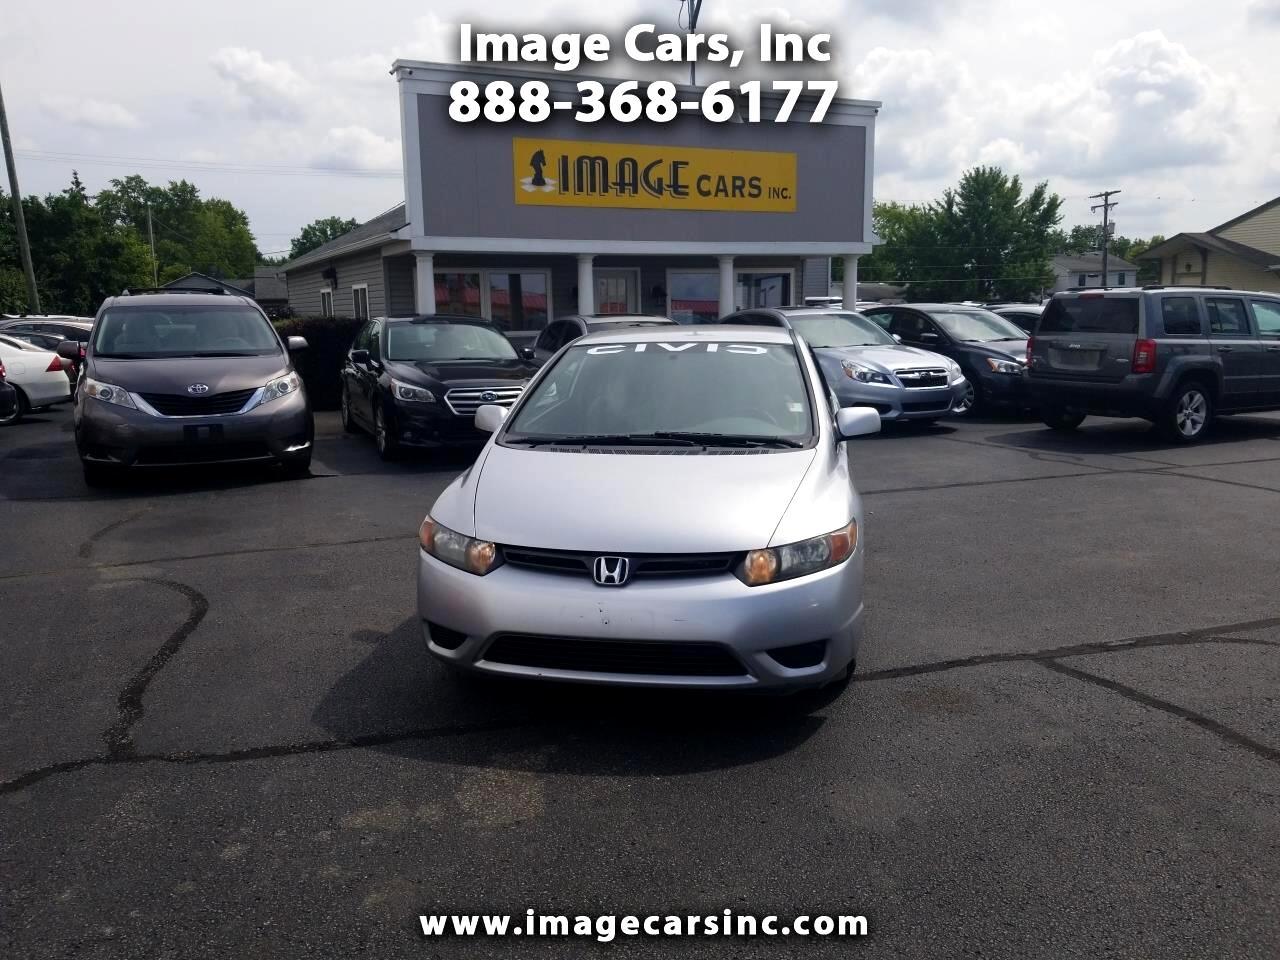 2008 Honda Civic LX coupe